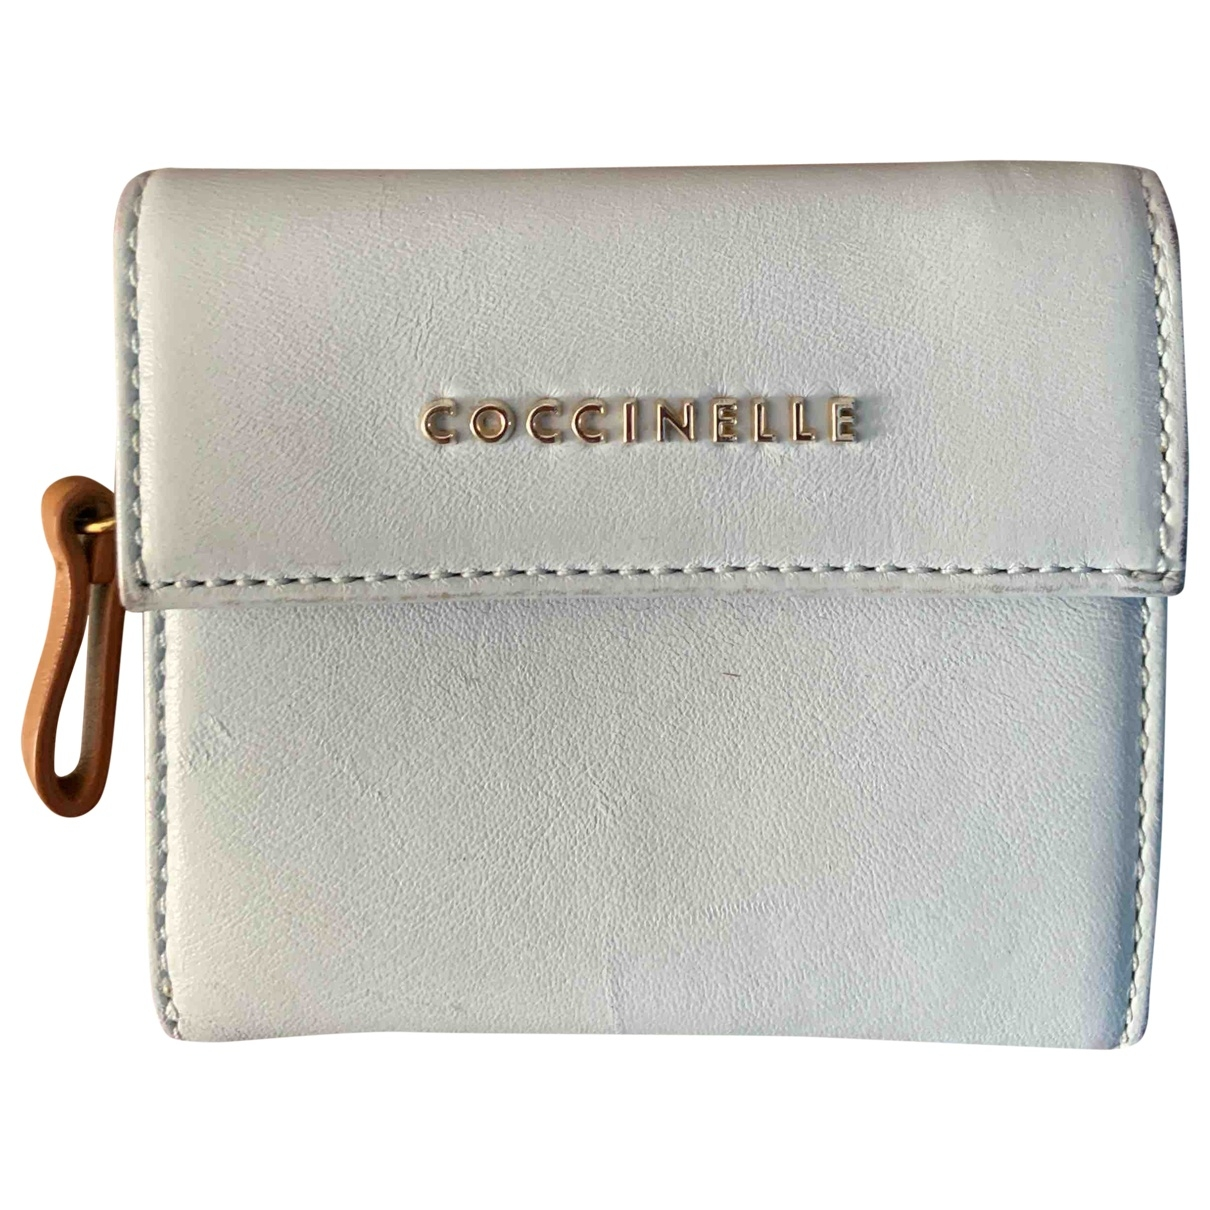 Coccinelle \N Portemonnaie in  Blau Leder